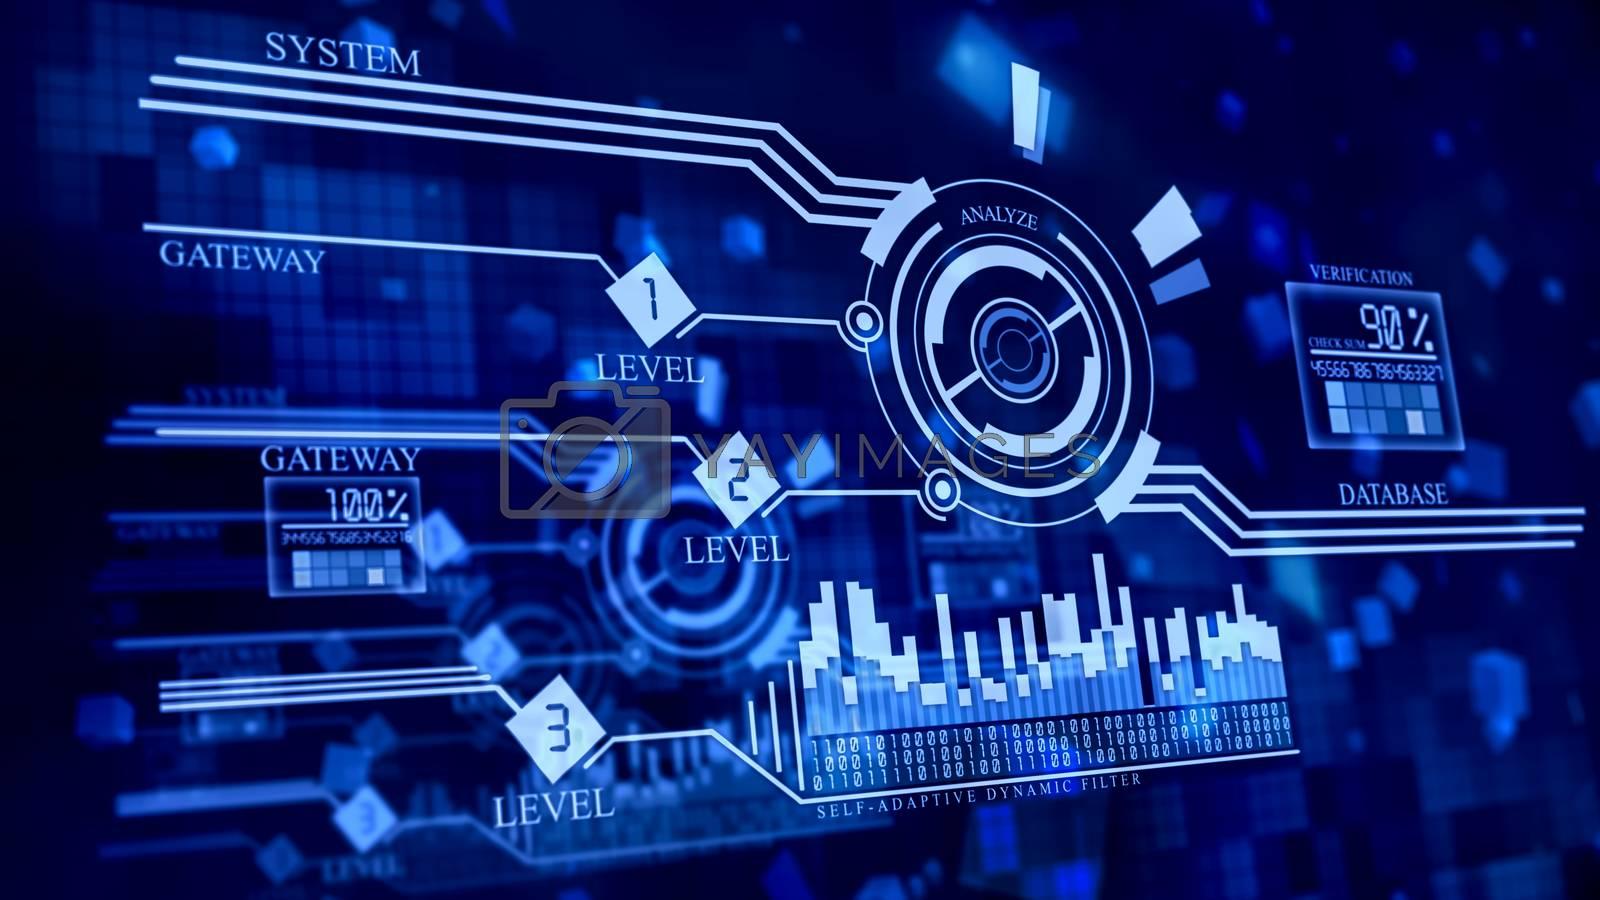 multi-leveled firewall in cyberspace by merzavka